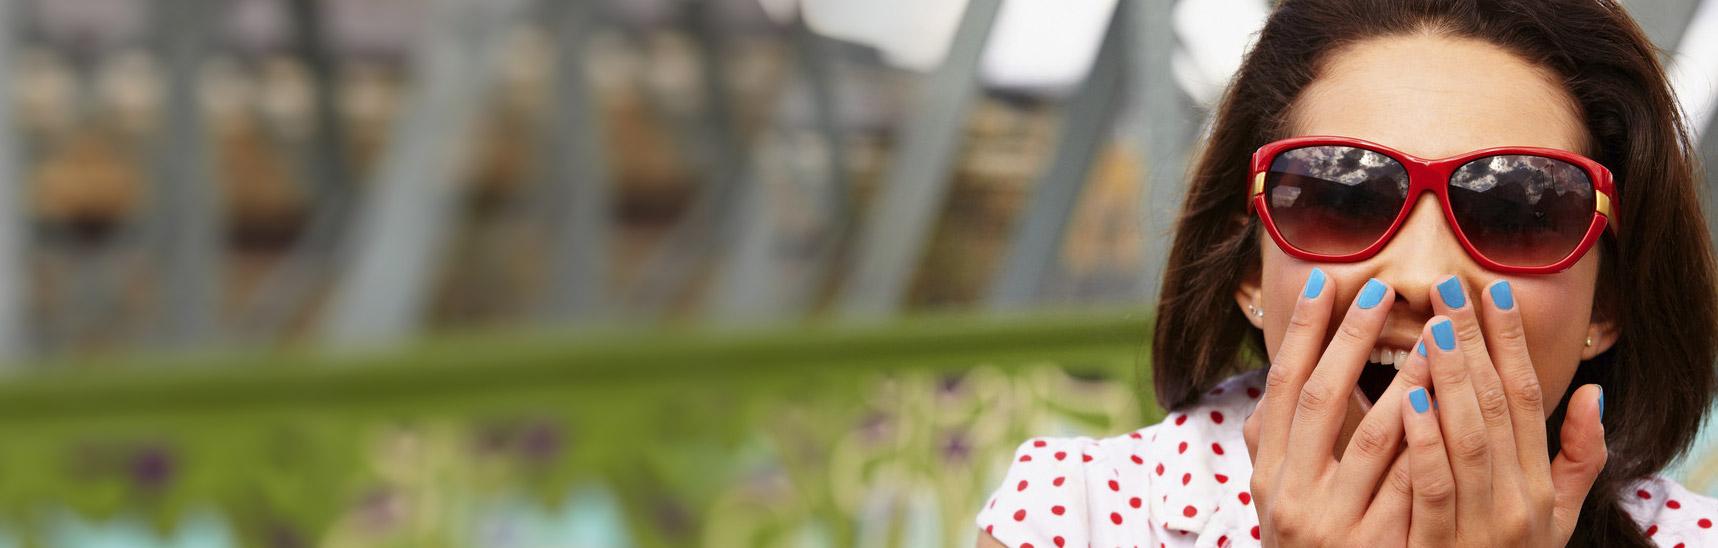 search beauty jobs at cvs health beauty careers